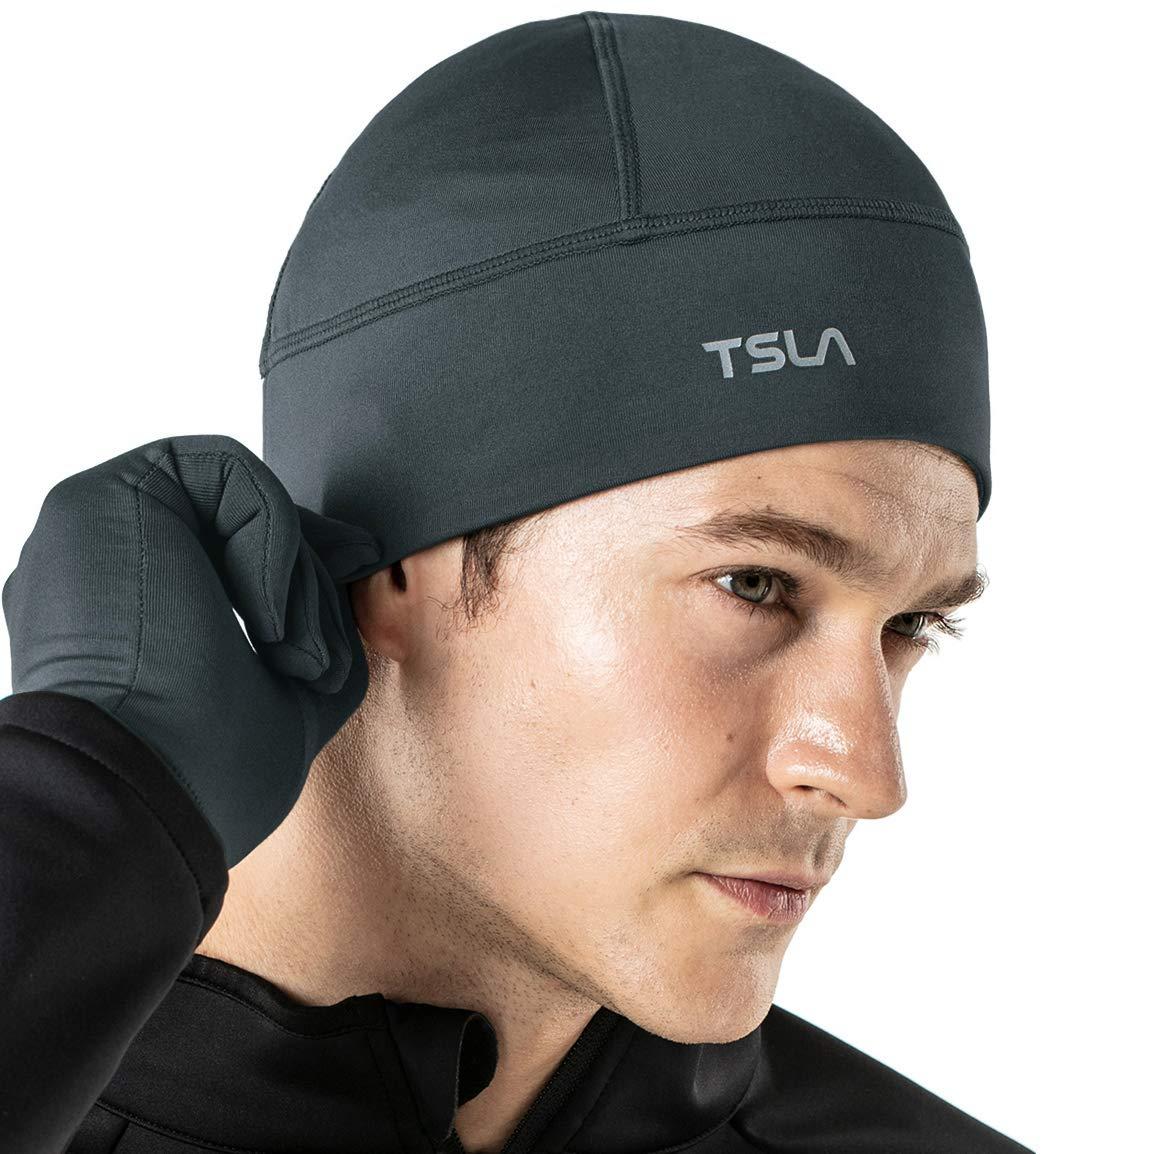 TSLA Unisex Skull Cap Thermal Fleece Line Active